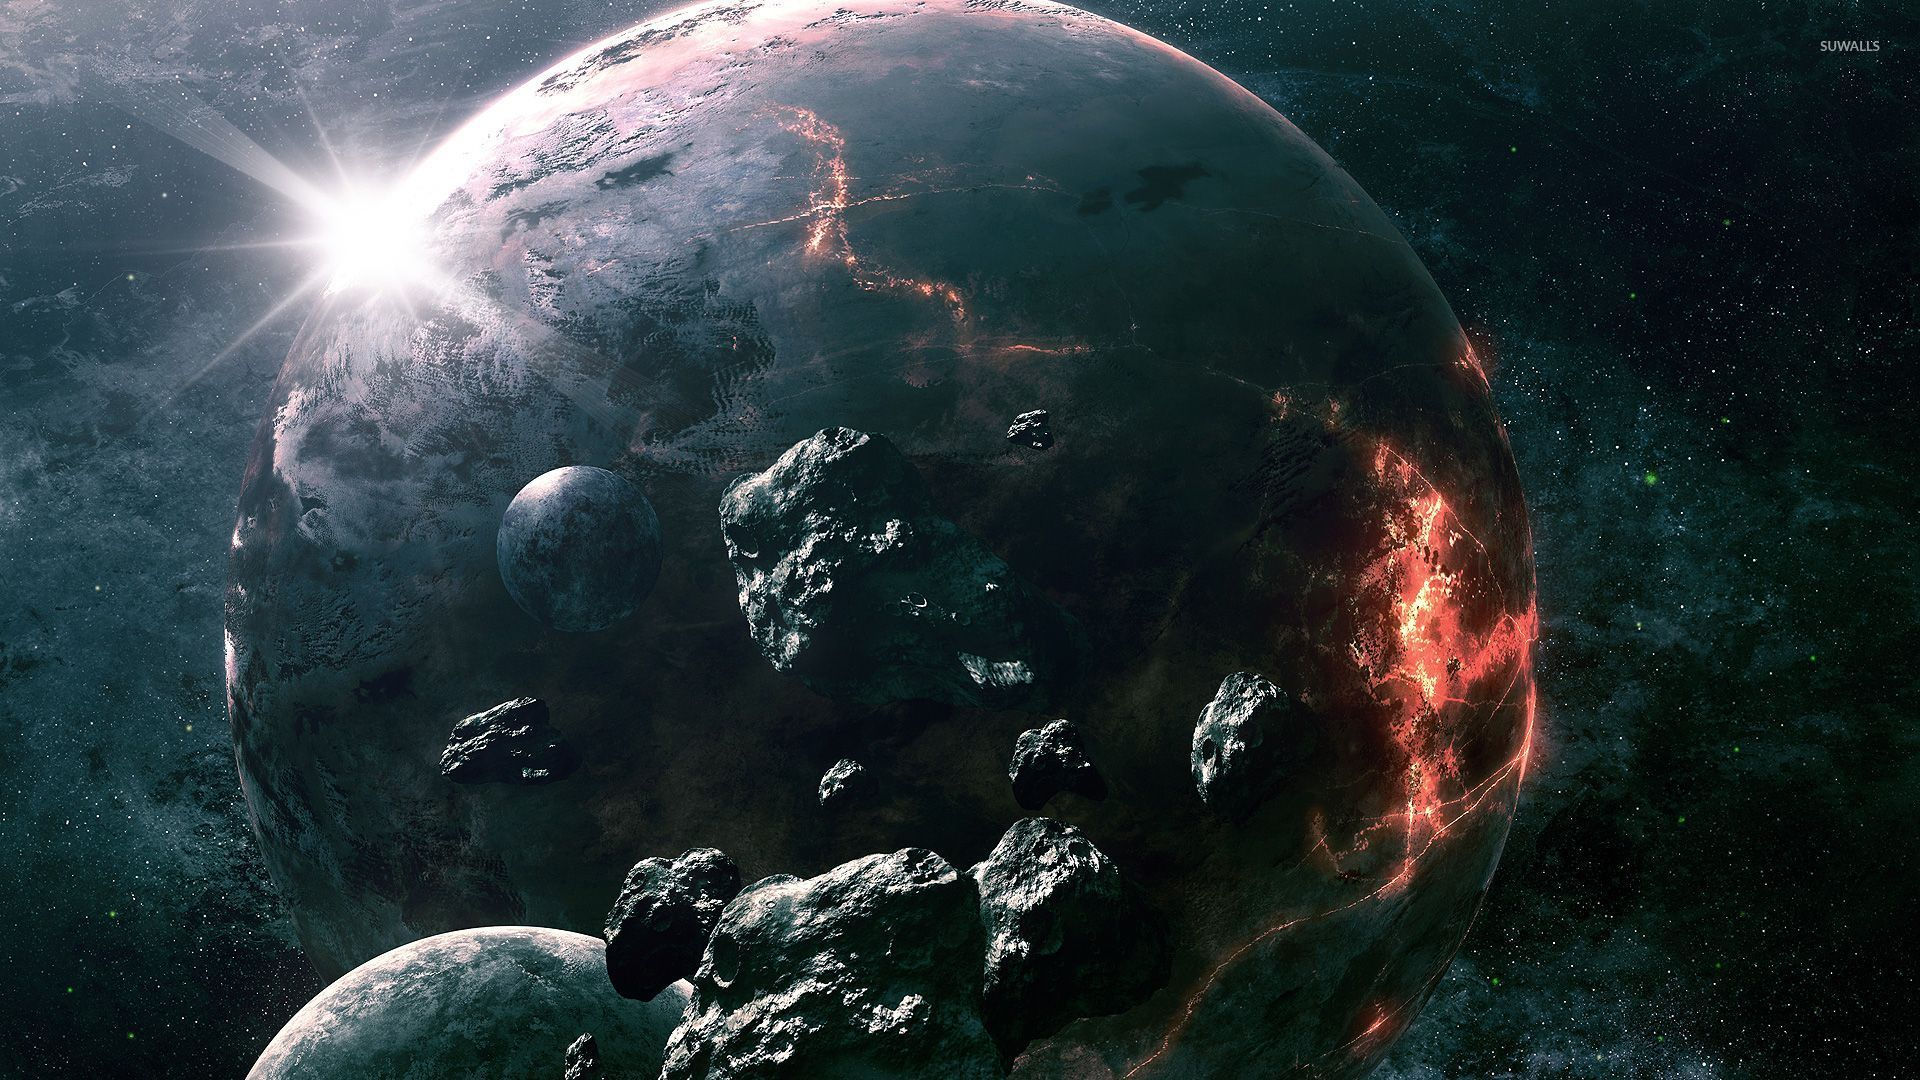 Boxing Ring Wallpaper Hd Meteorite Circling The Imploding Planet Wallpaper